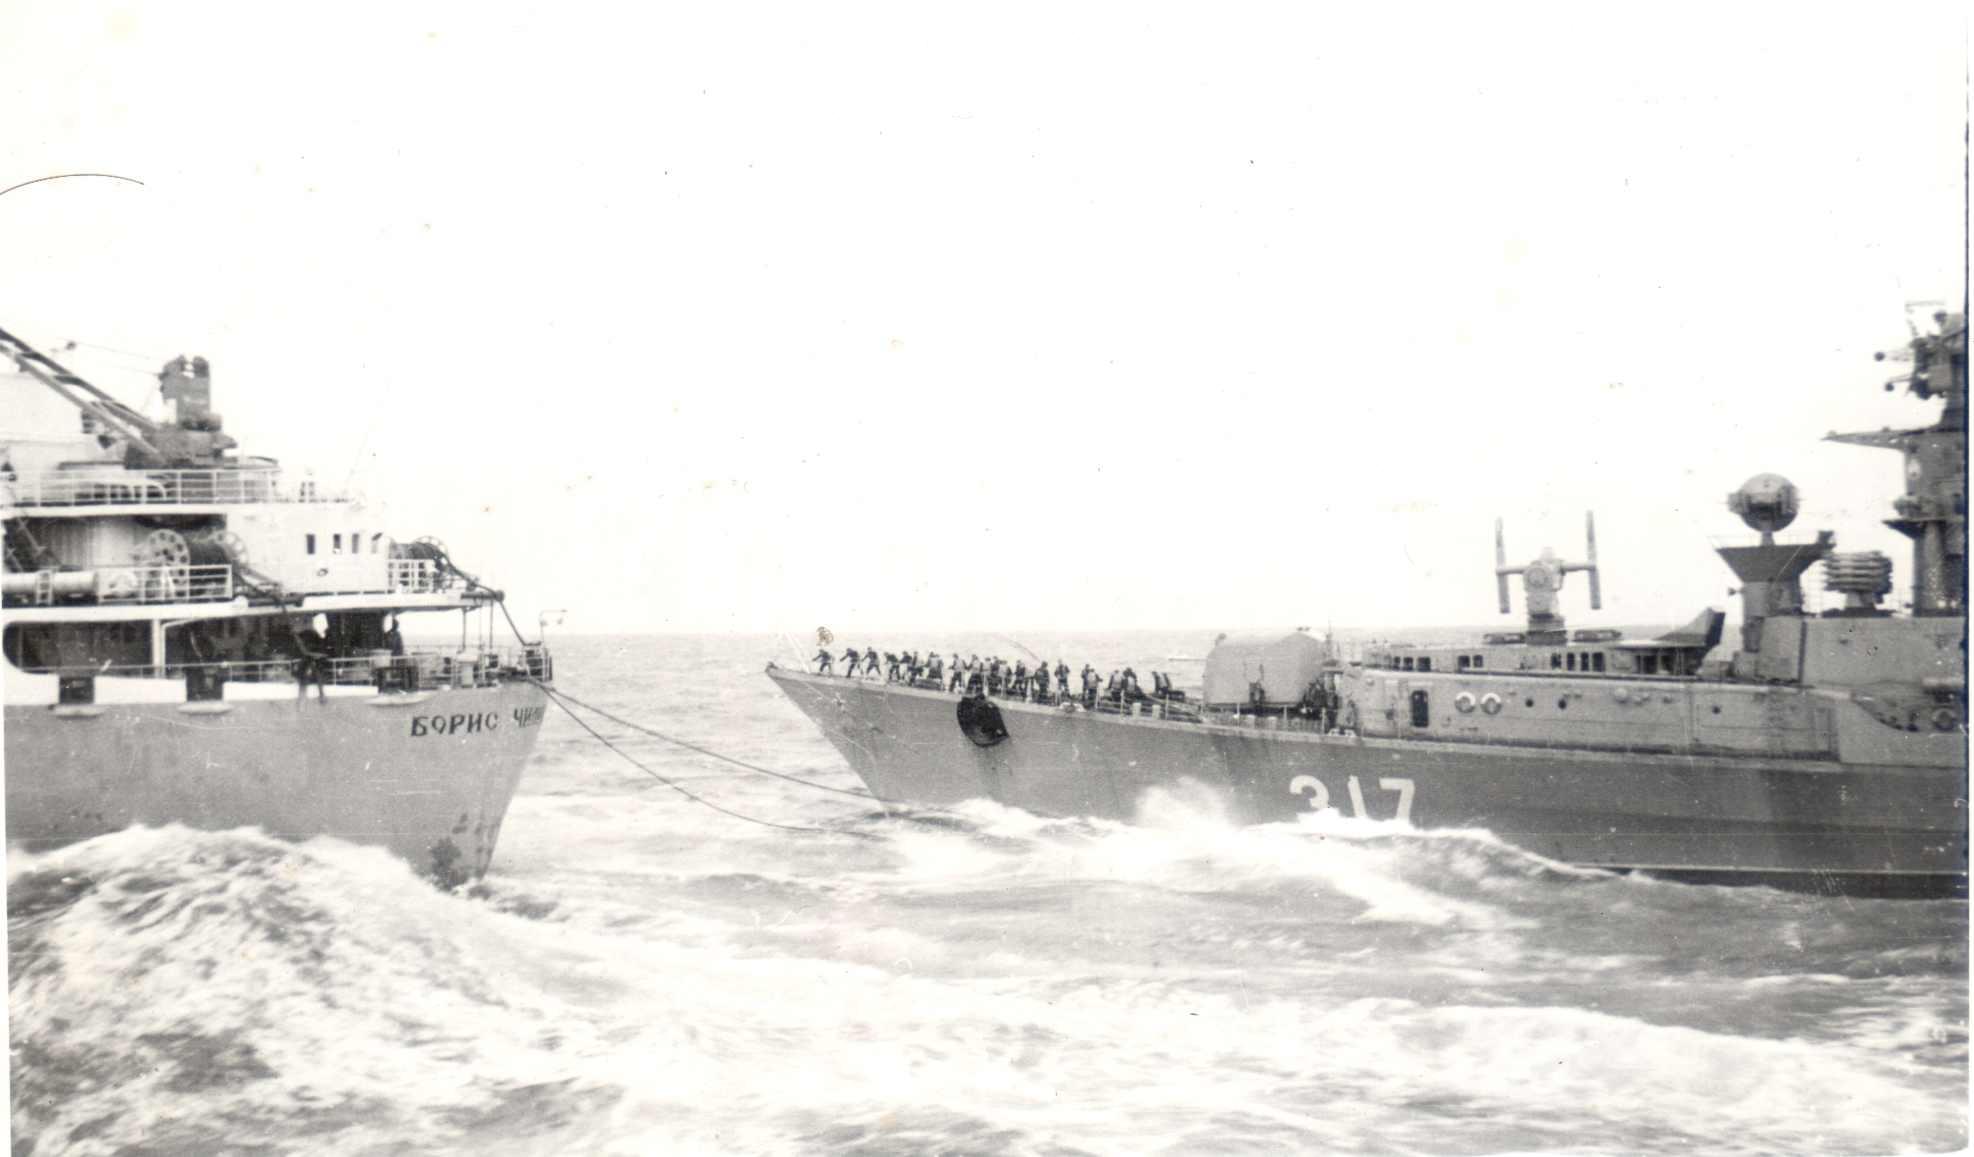 Фото экипажа танкера борис чиликин